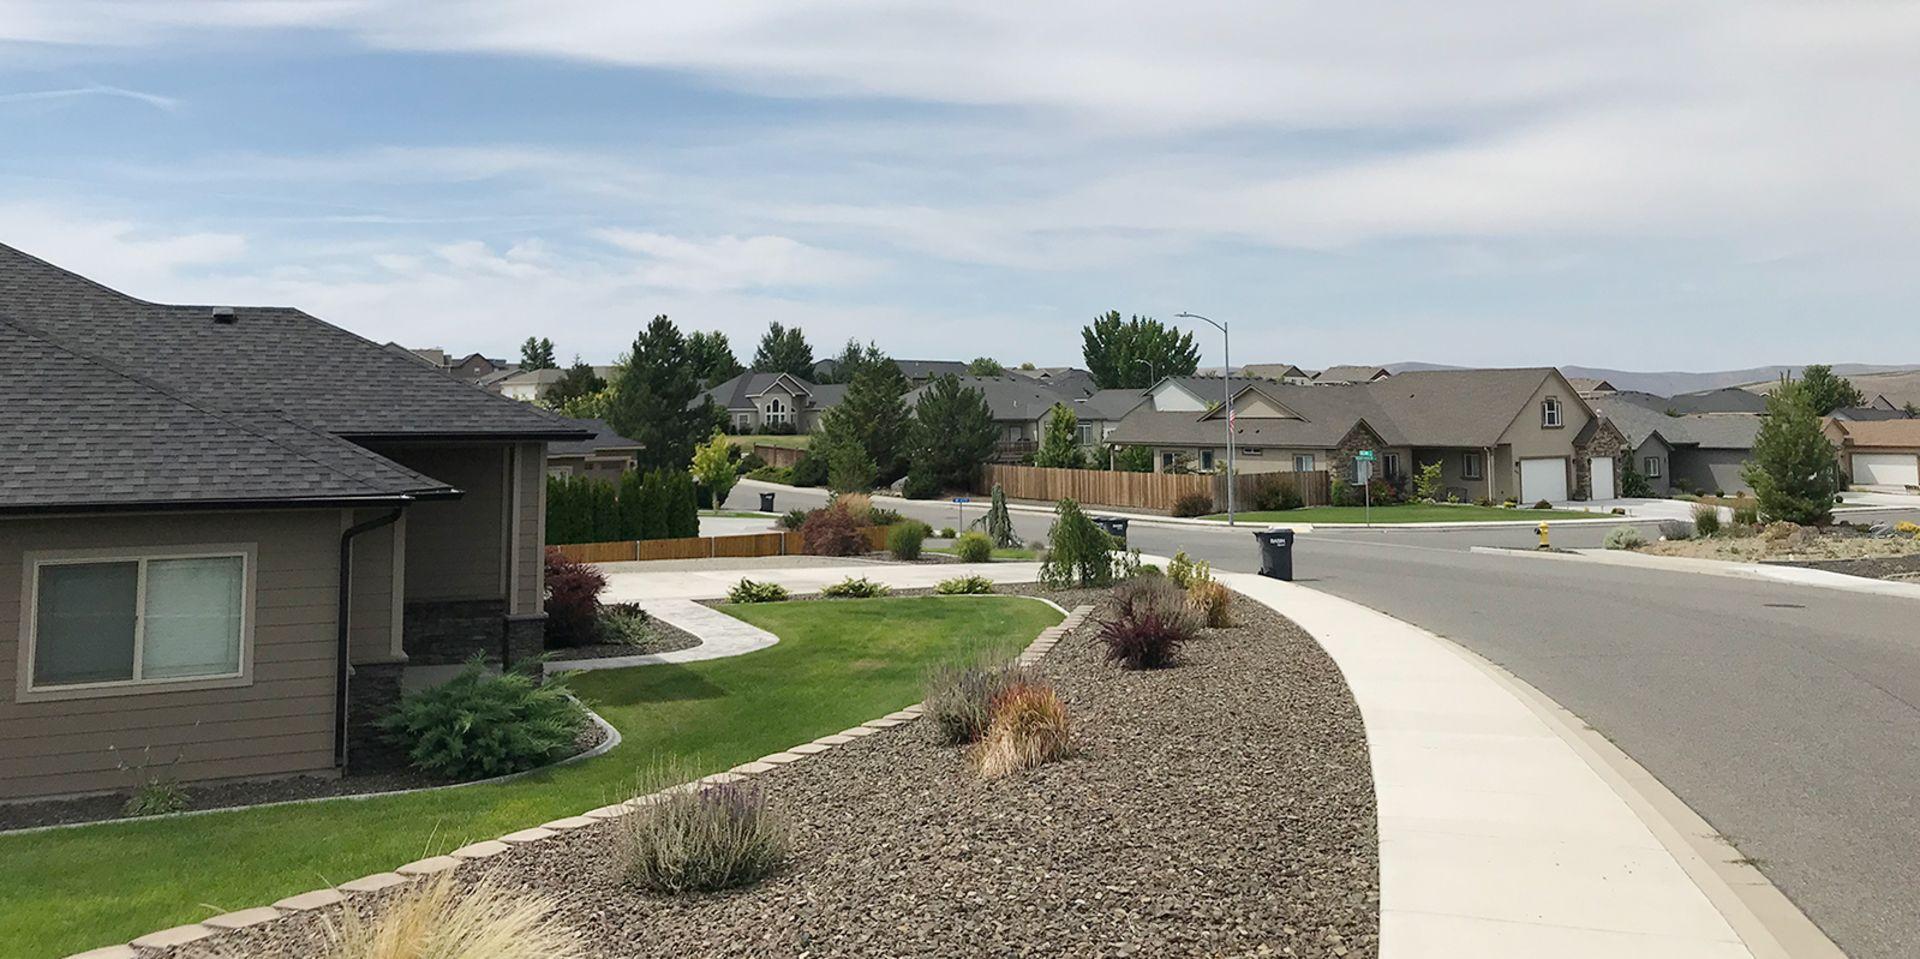 West Richland Named 4th-Safest City in Washington